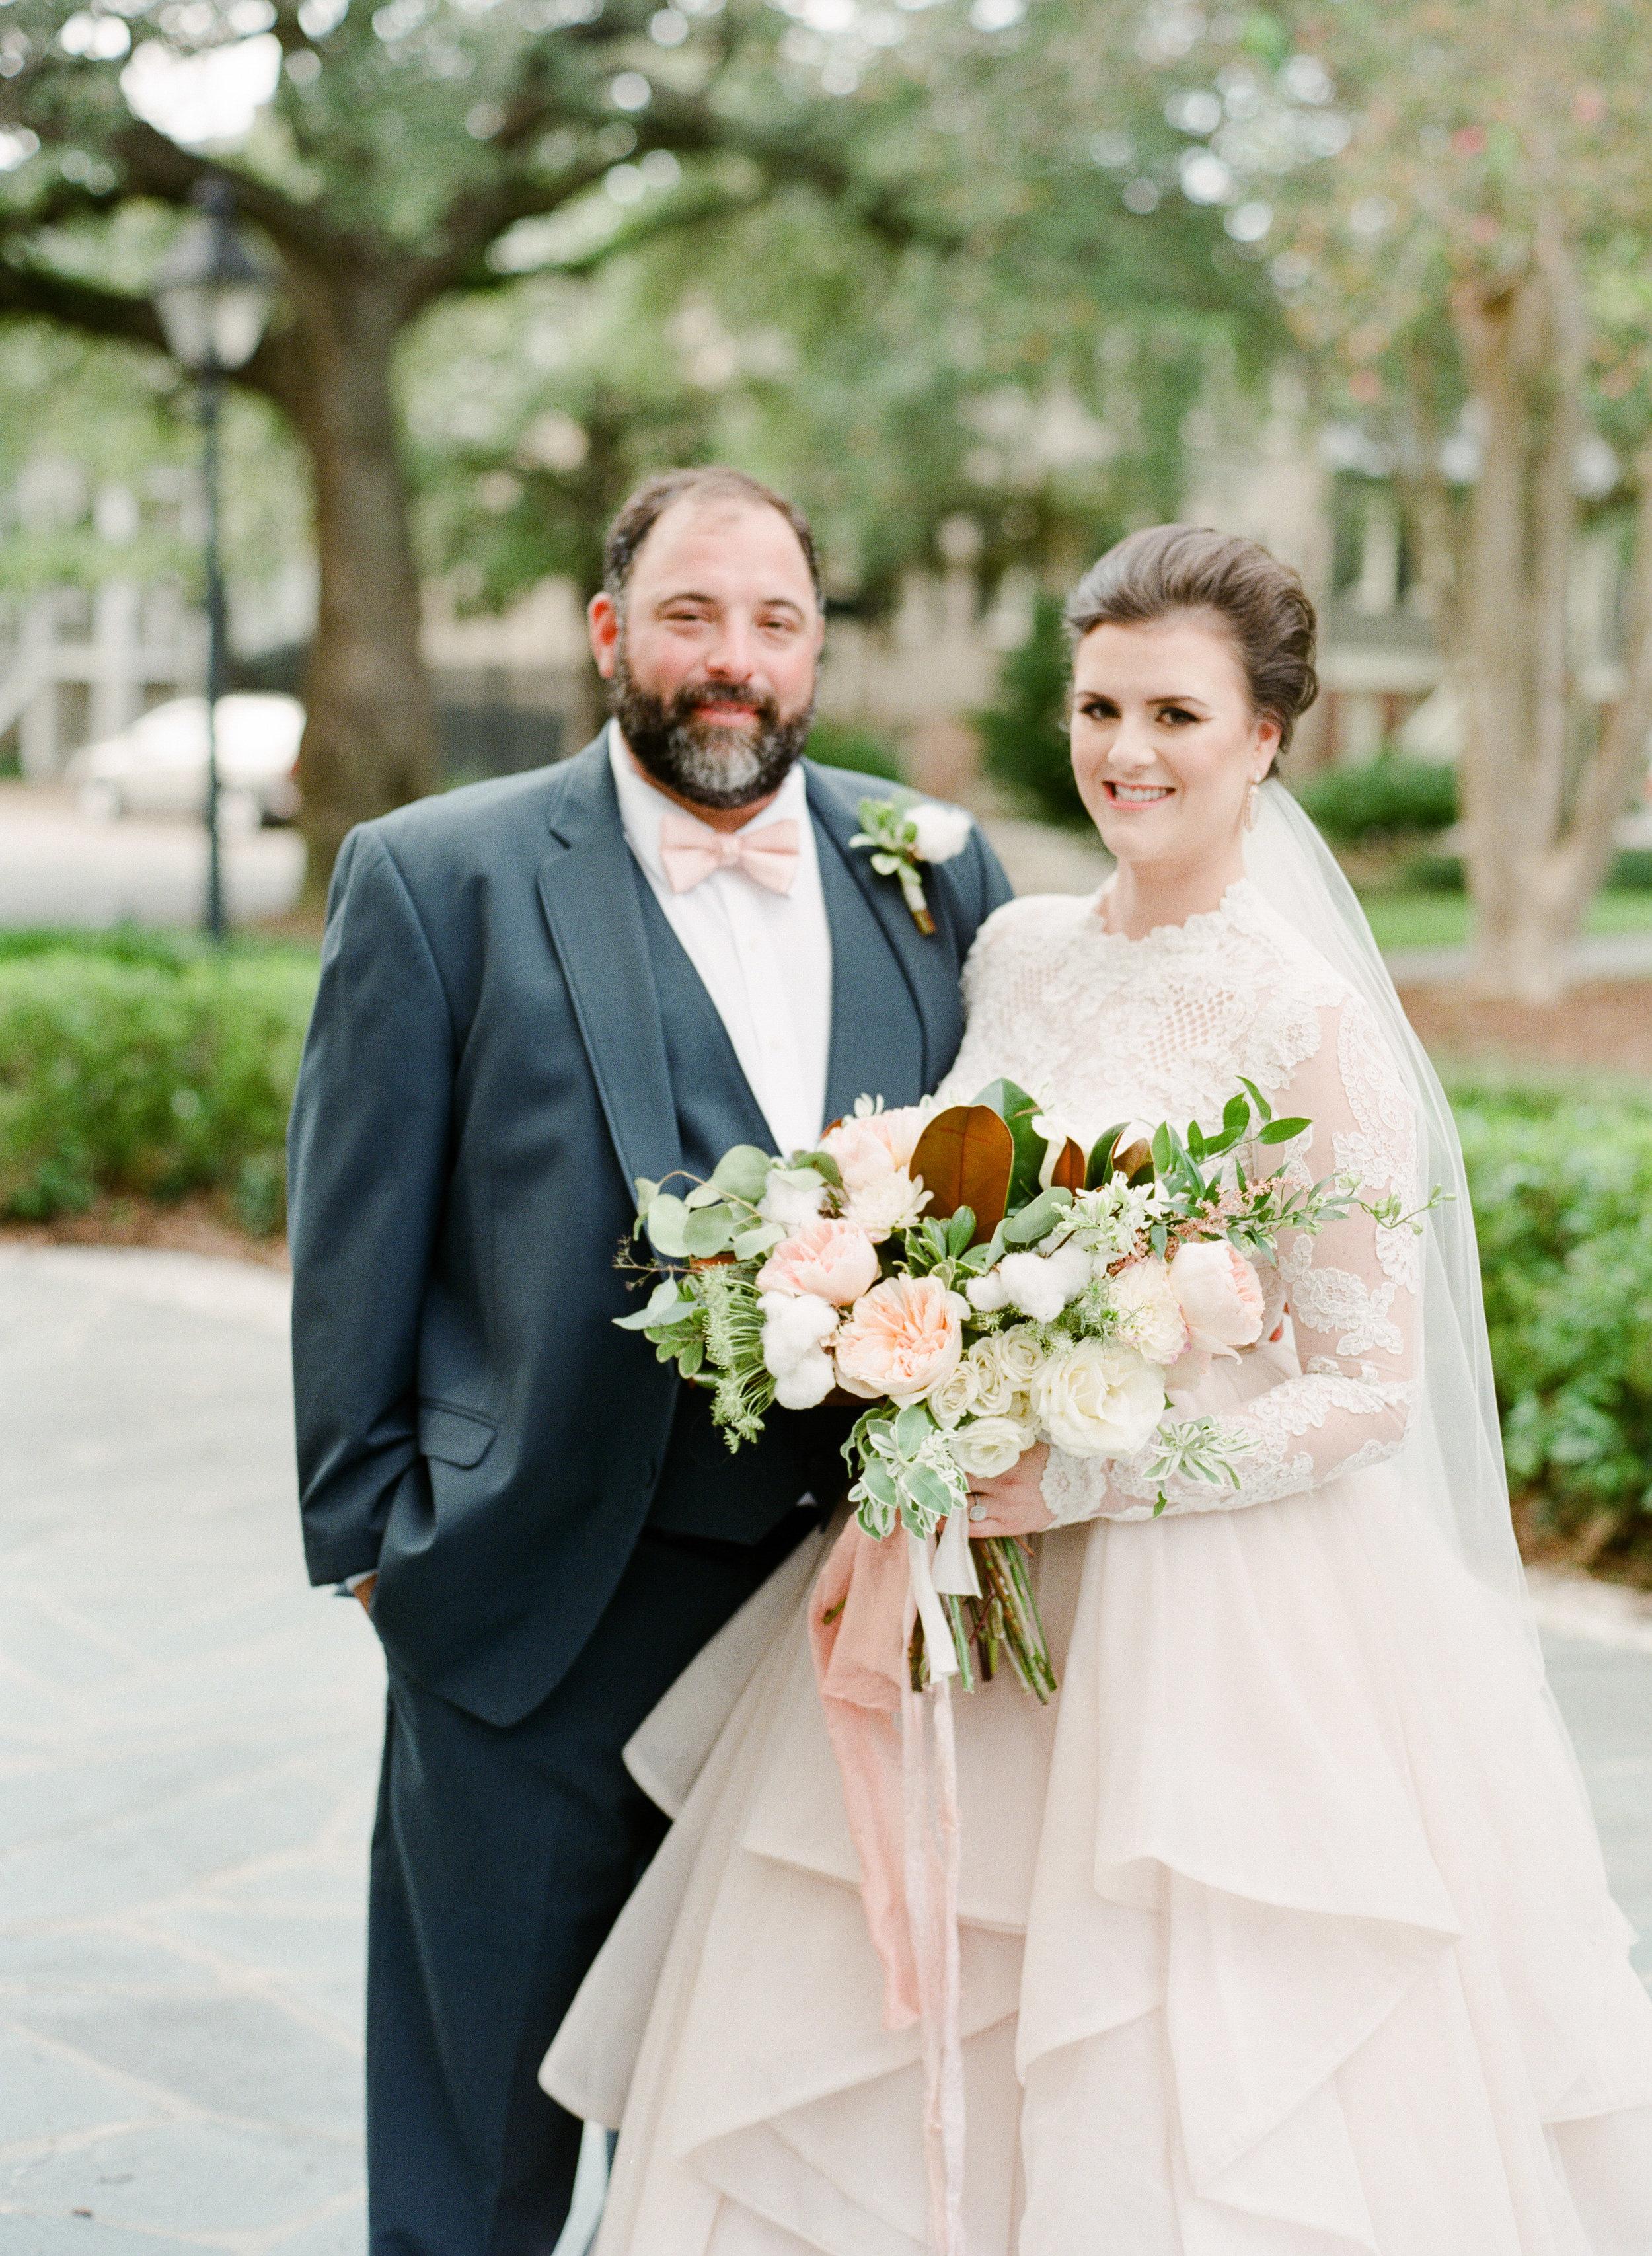 savannah-cha-bella-wedding-15.jpg